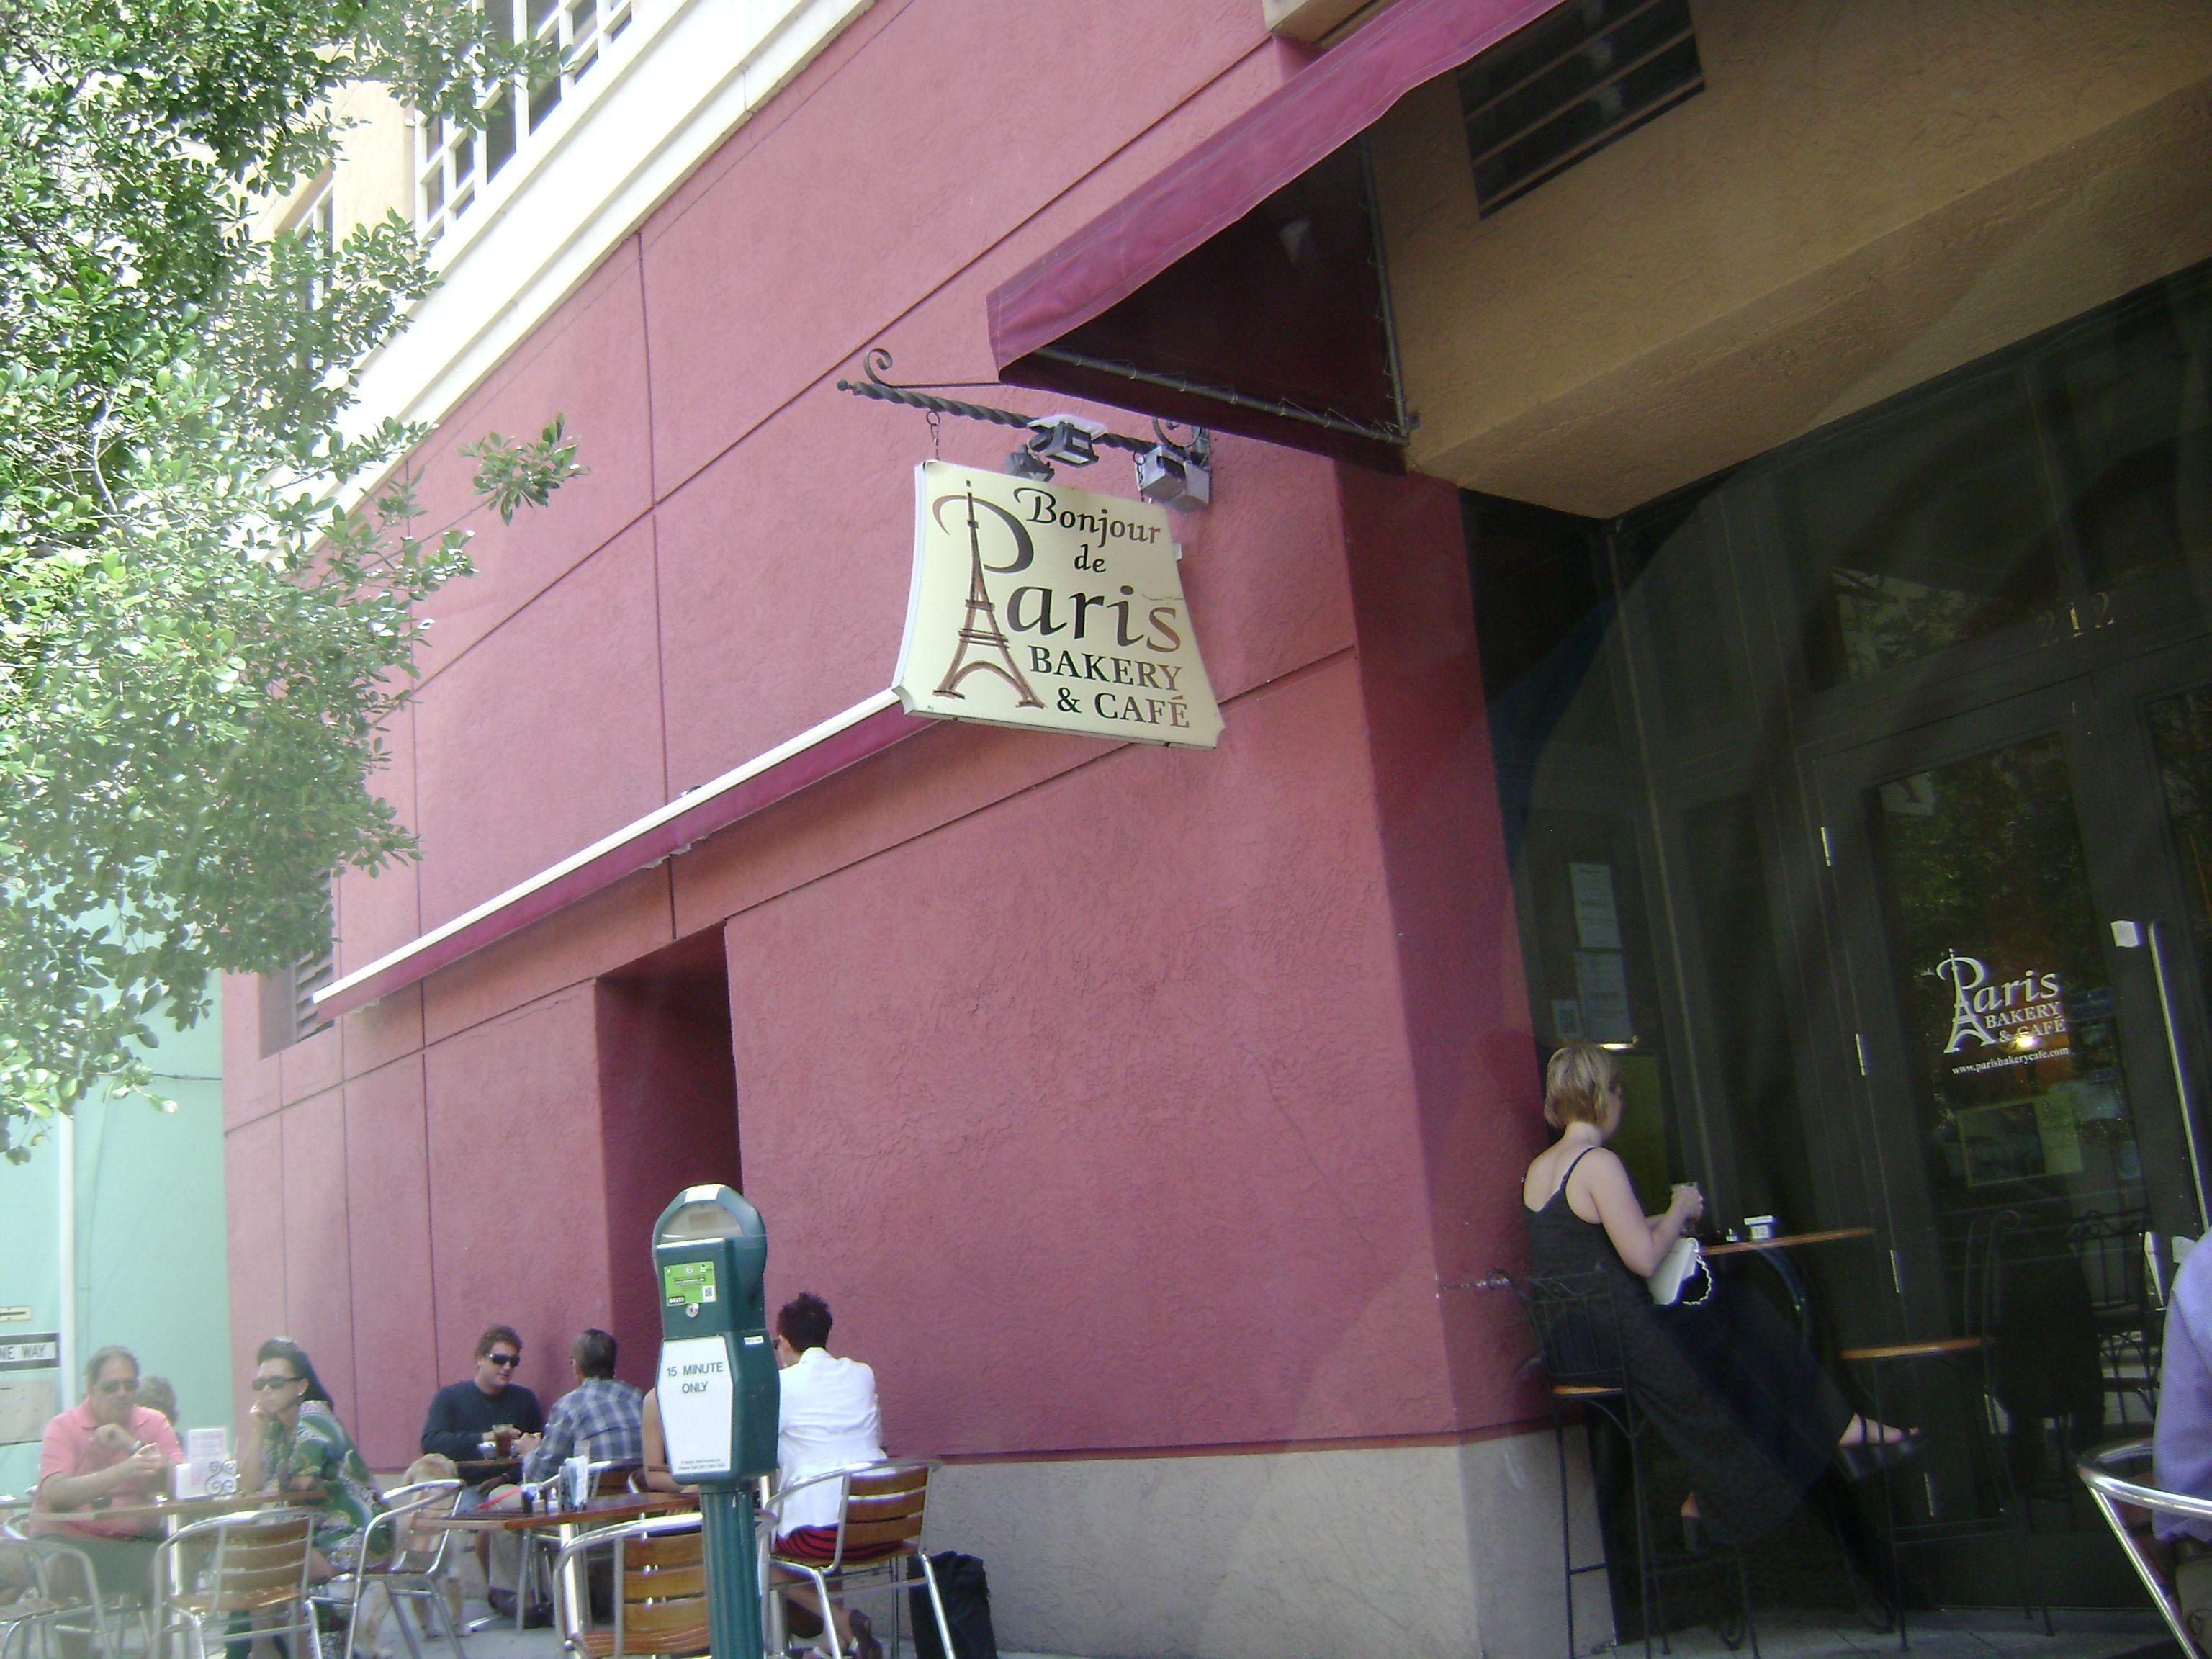 Bonjour De Paris Bakery Cafe In West Palm Beach Florida Tourism Florida Adventures Palm Beach